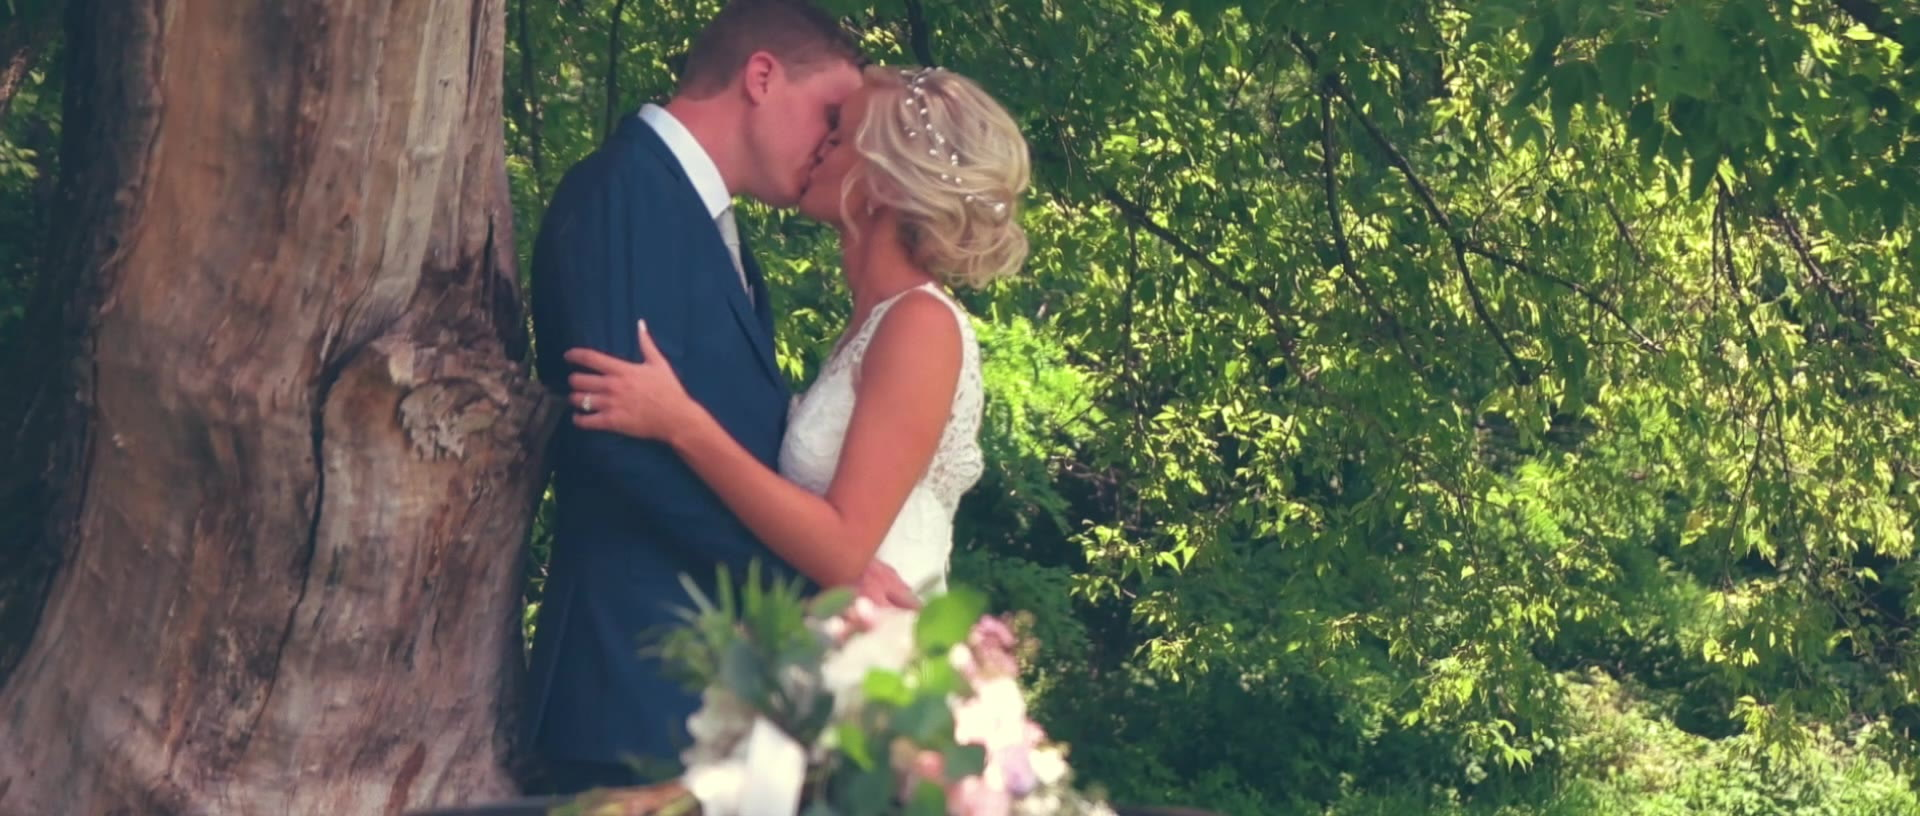 Lindsay + Scott | Cottage Grove, Minnesota | Historic Hope Glen Farm